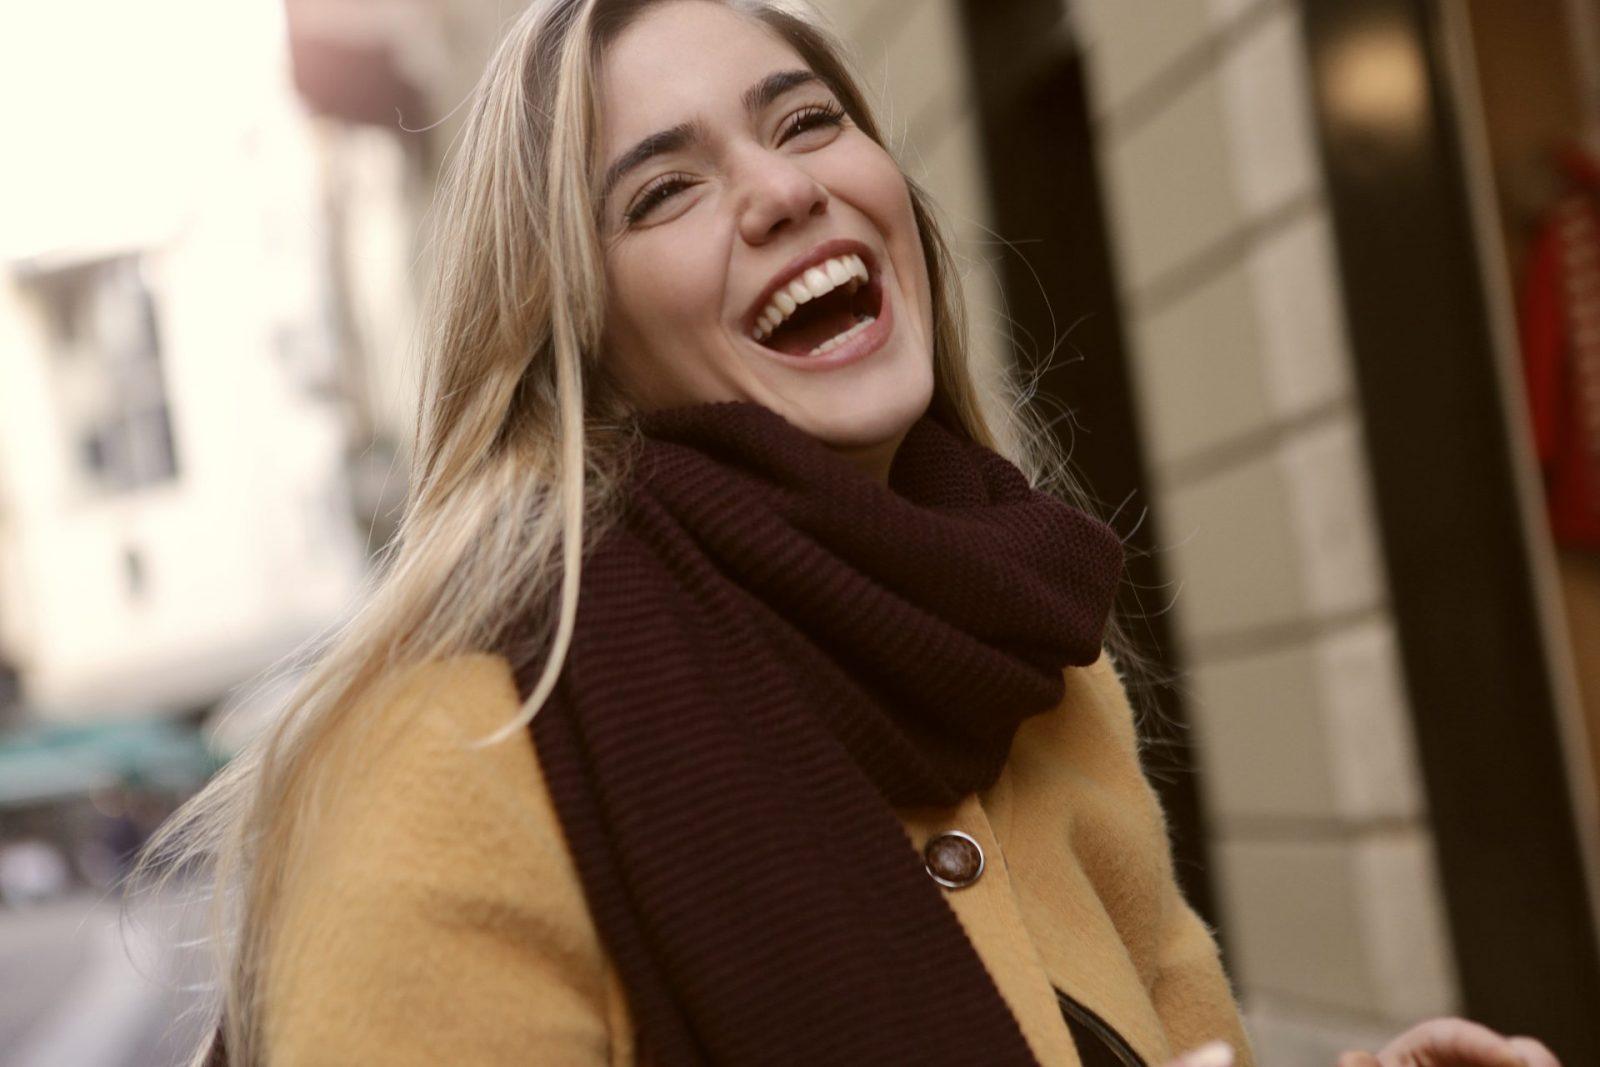 Laughter is the best medicine, still